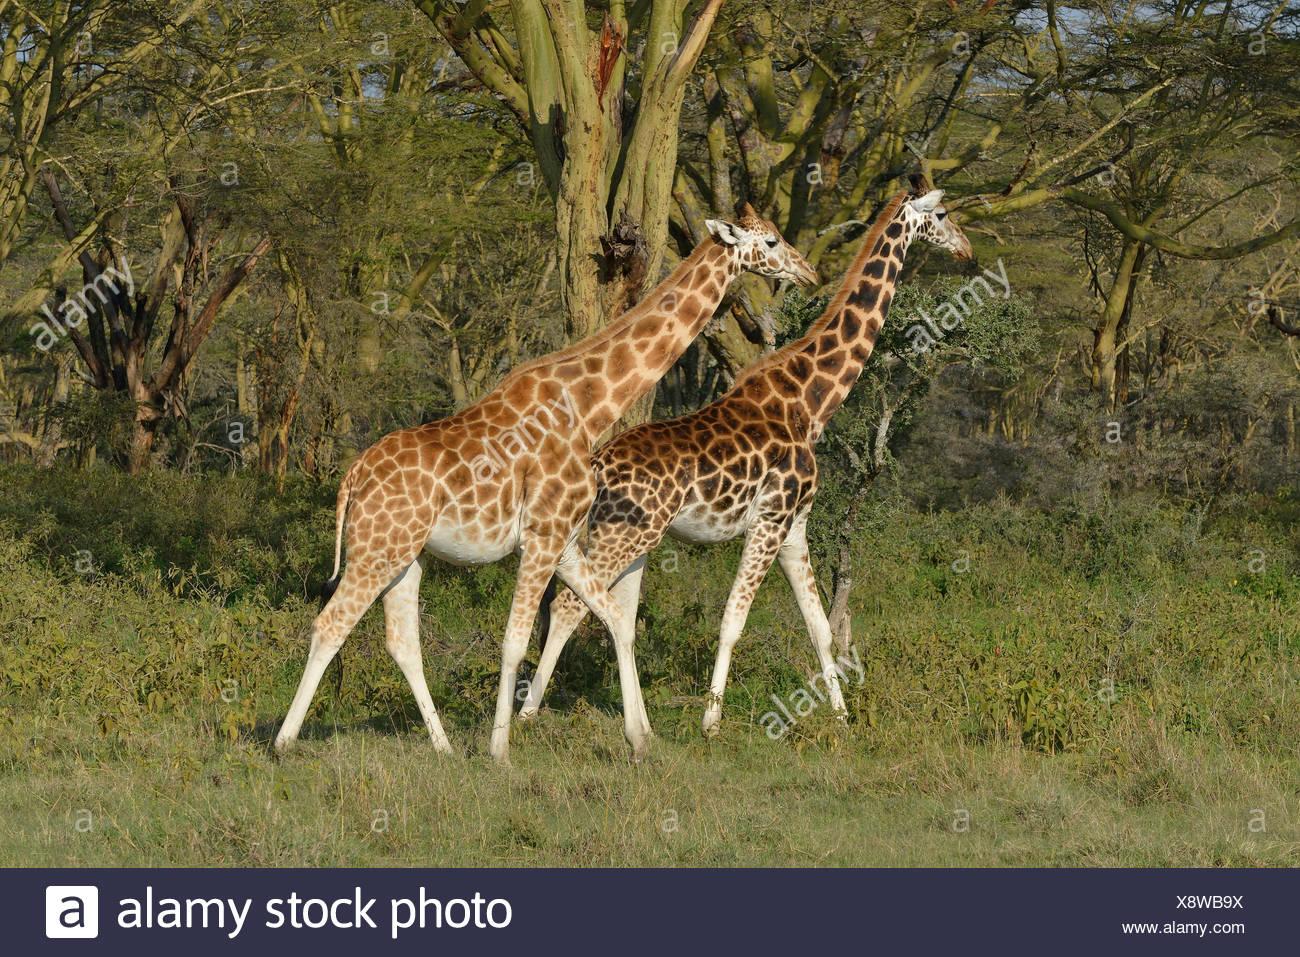 zoology / animals, mammal (mammalia), Rothschild's, Baringo- or Ugandan giraffes (Giraffa camelopardalis rothschildi), Lake Nakuru, Nakuru National Park, Kenya, Africa, Additional-Rights-Clearance-Info-Not-Available - Stock Image